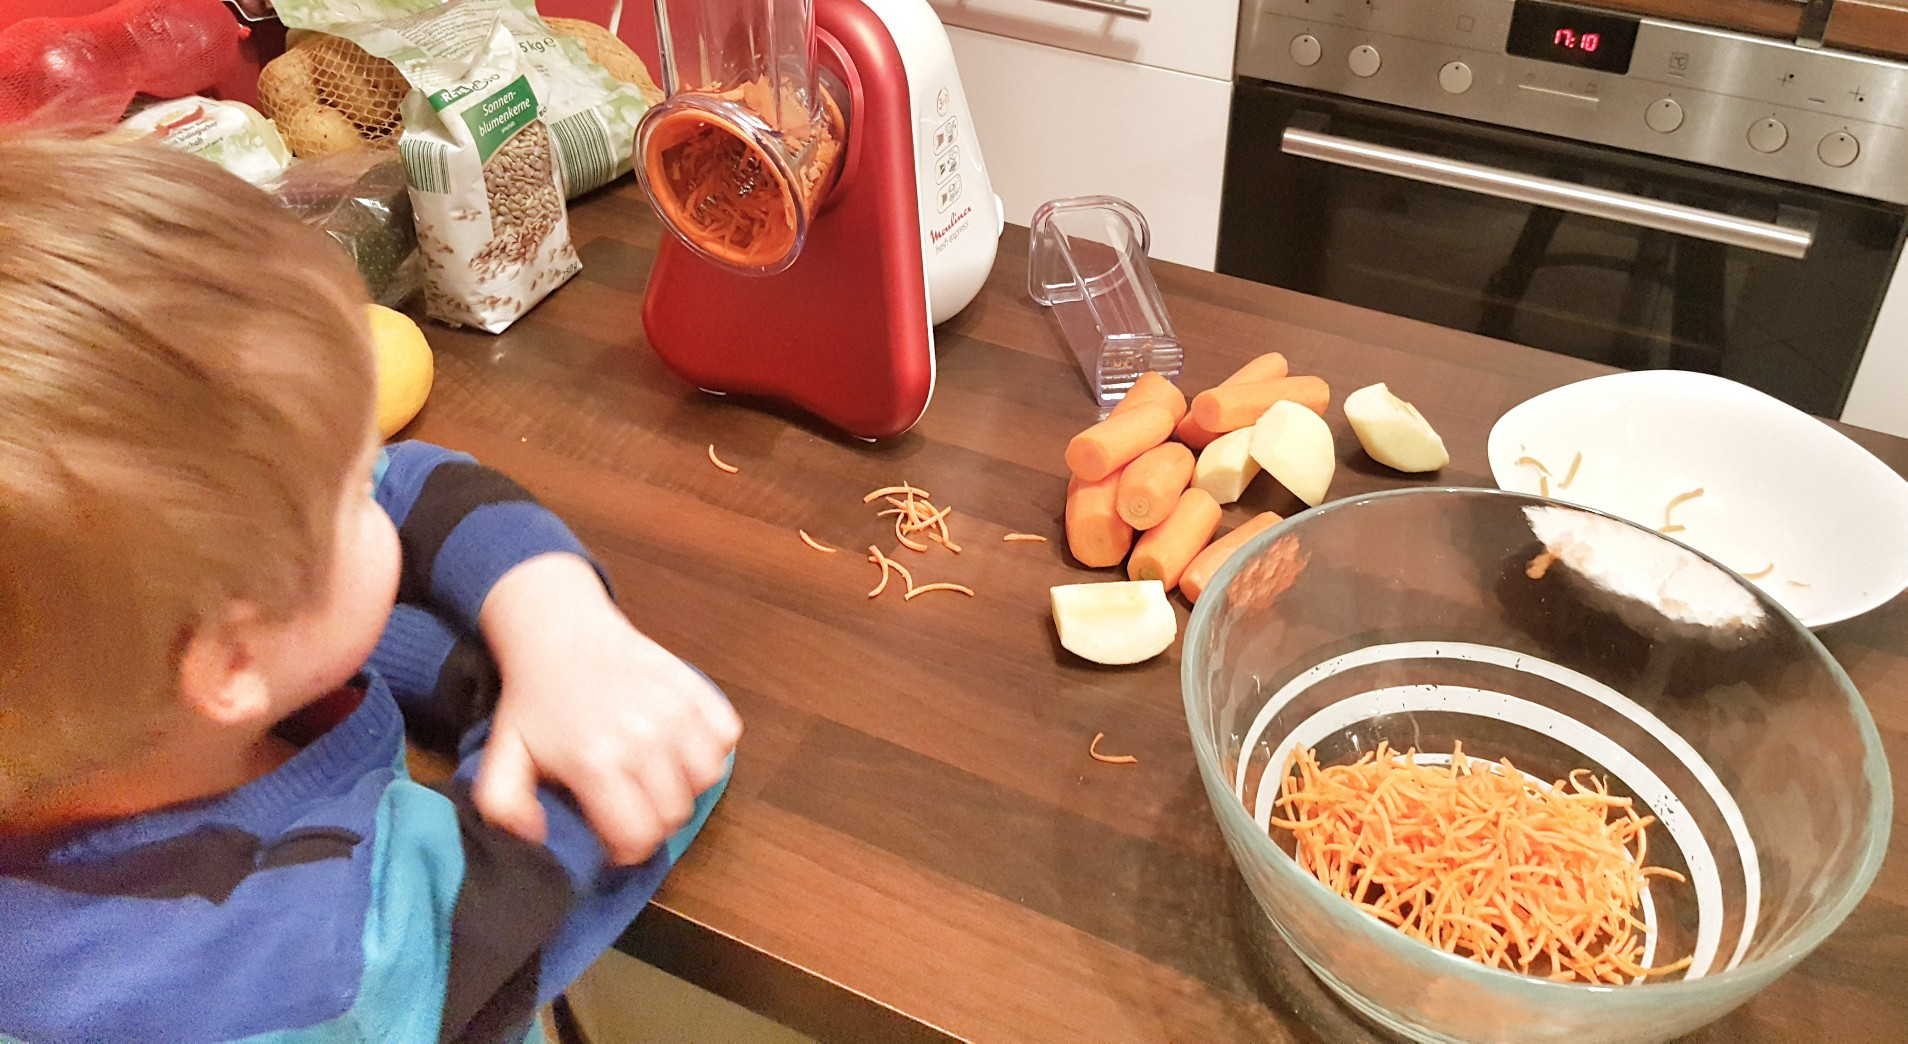 Karotten-Apfelsalat zur Spätzlpfanne - Rezept